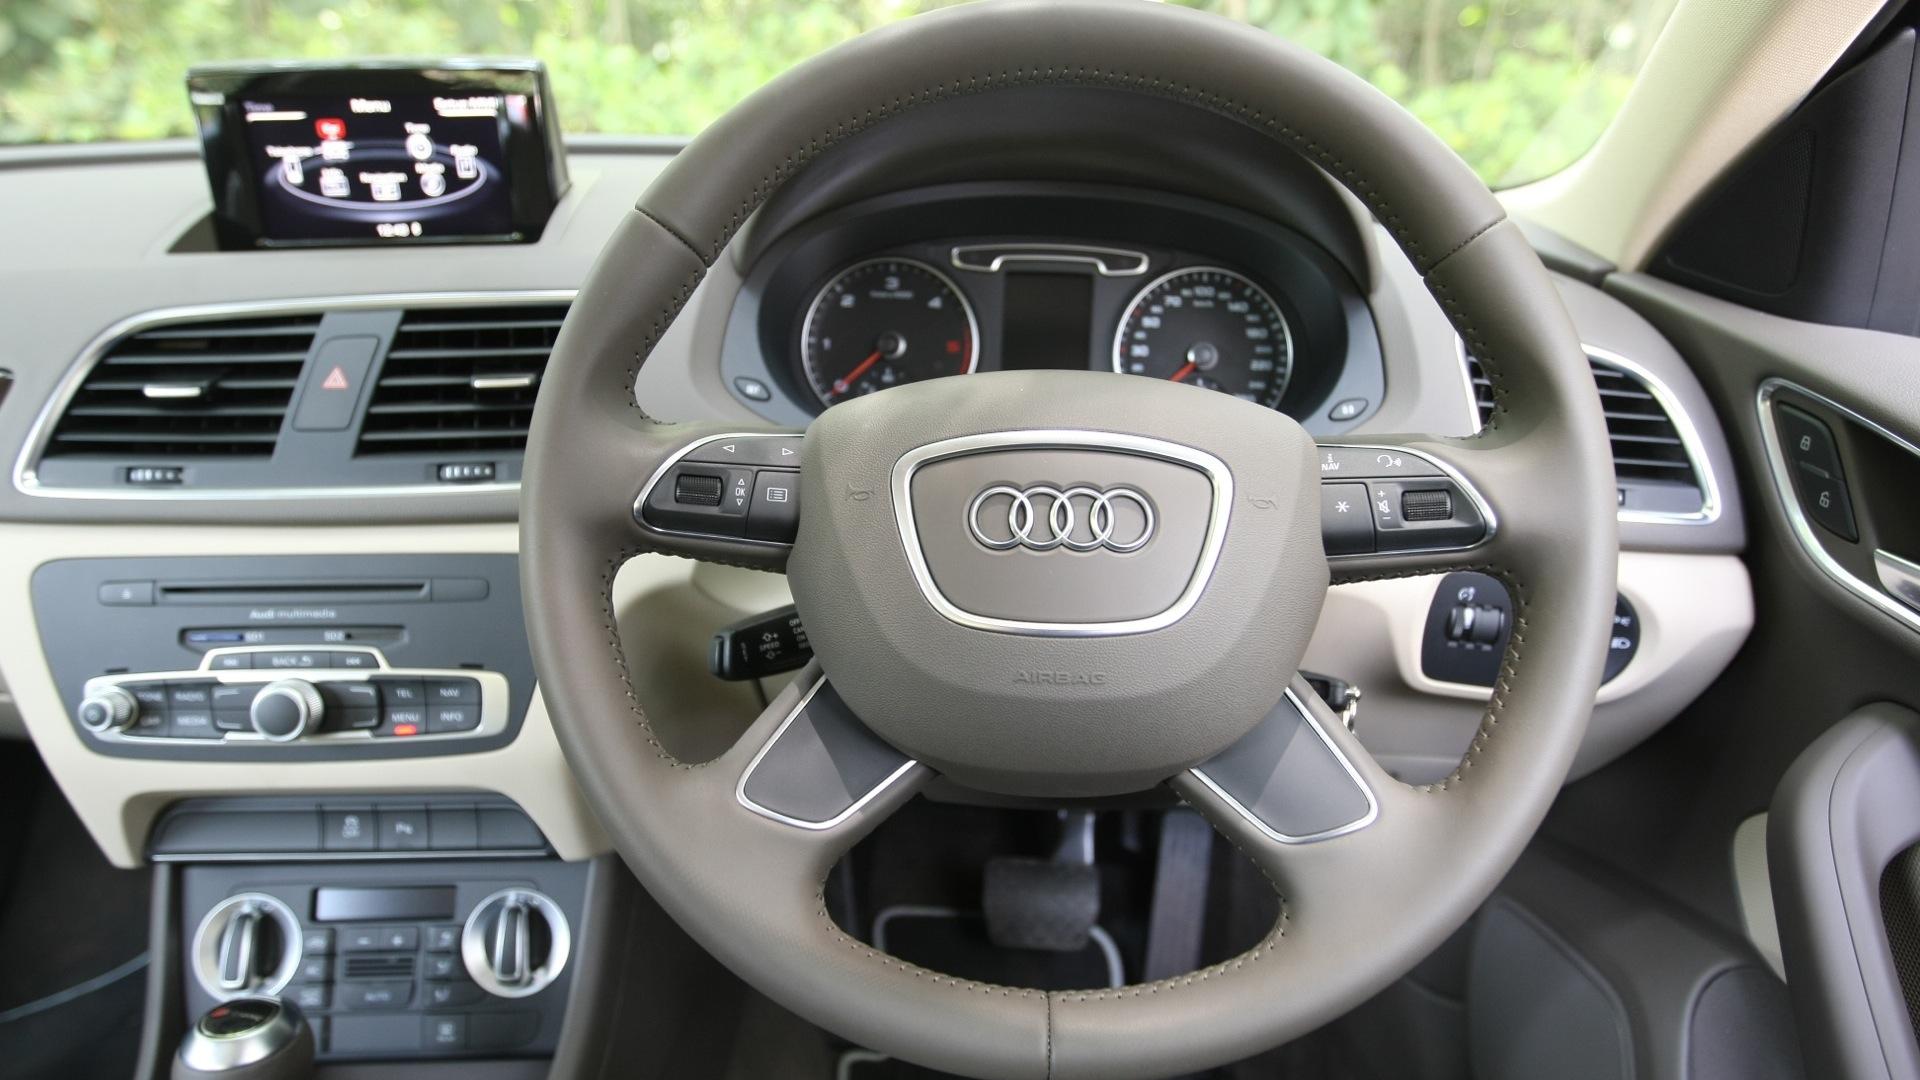 Kekurangan Audi Q3 2012 Spesifikasi